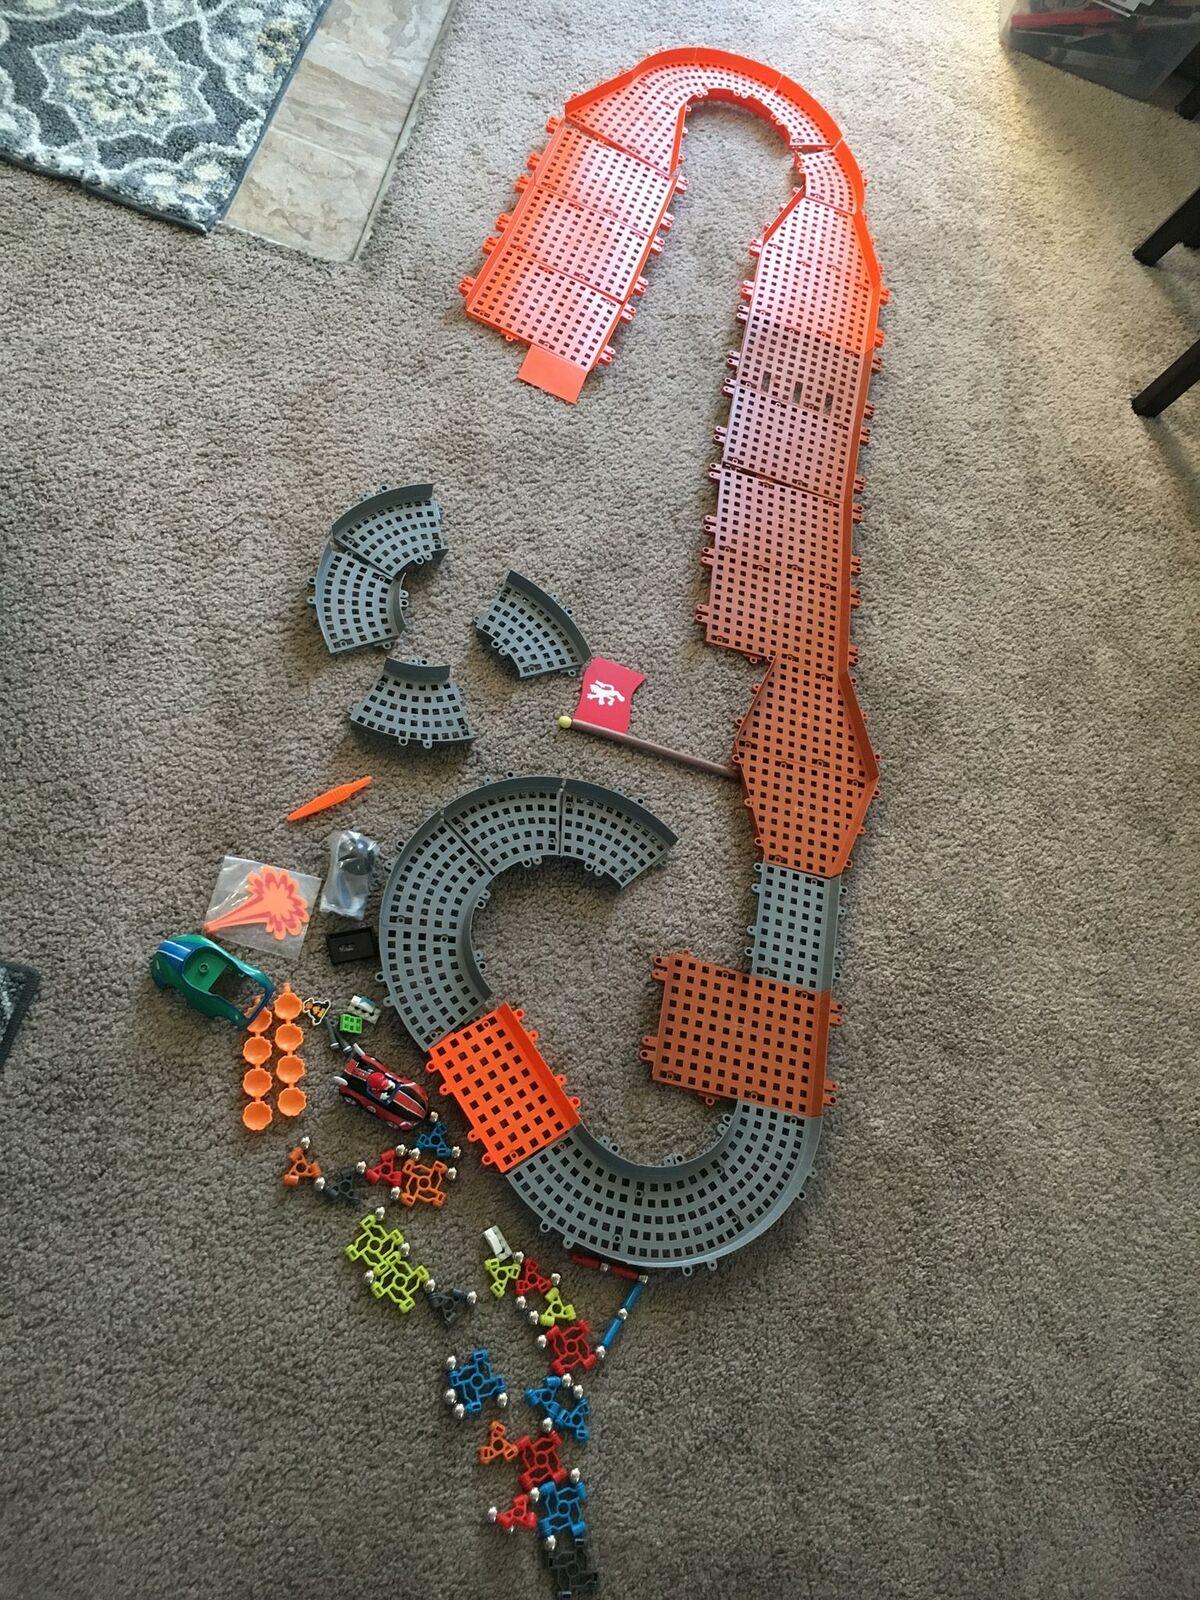 K'nex Mario Kart wii Bowsers Castle Ultimate Building Set (used)